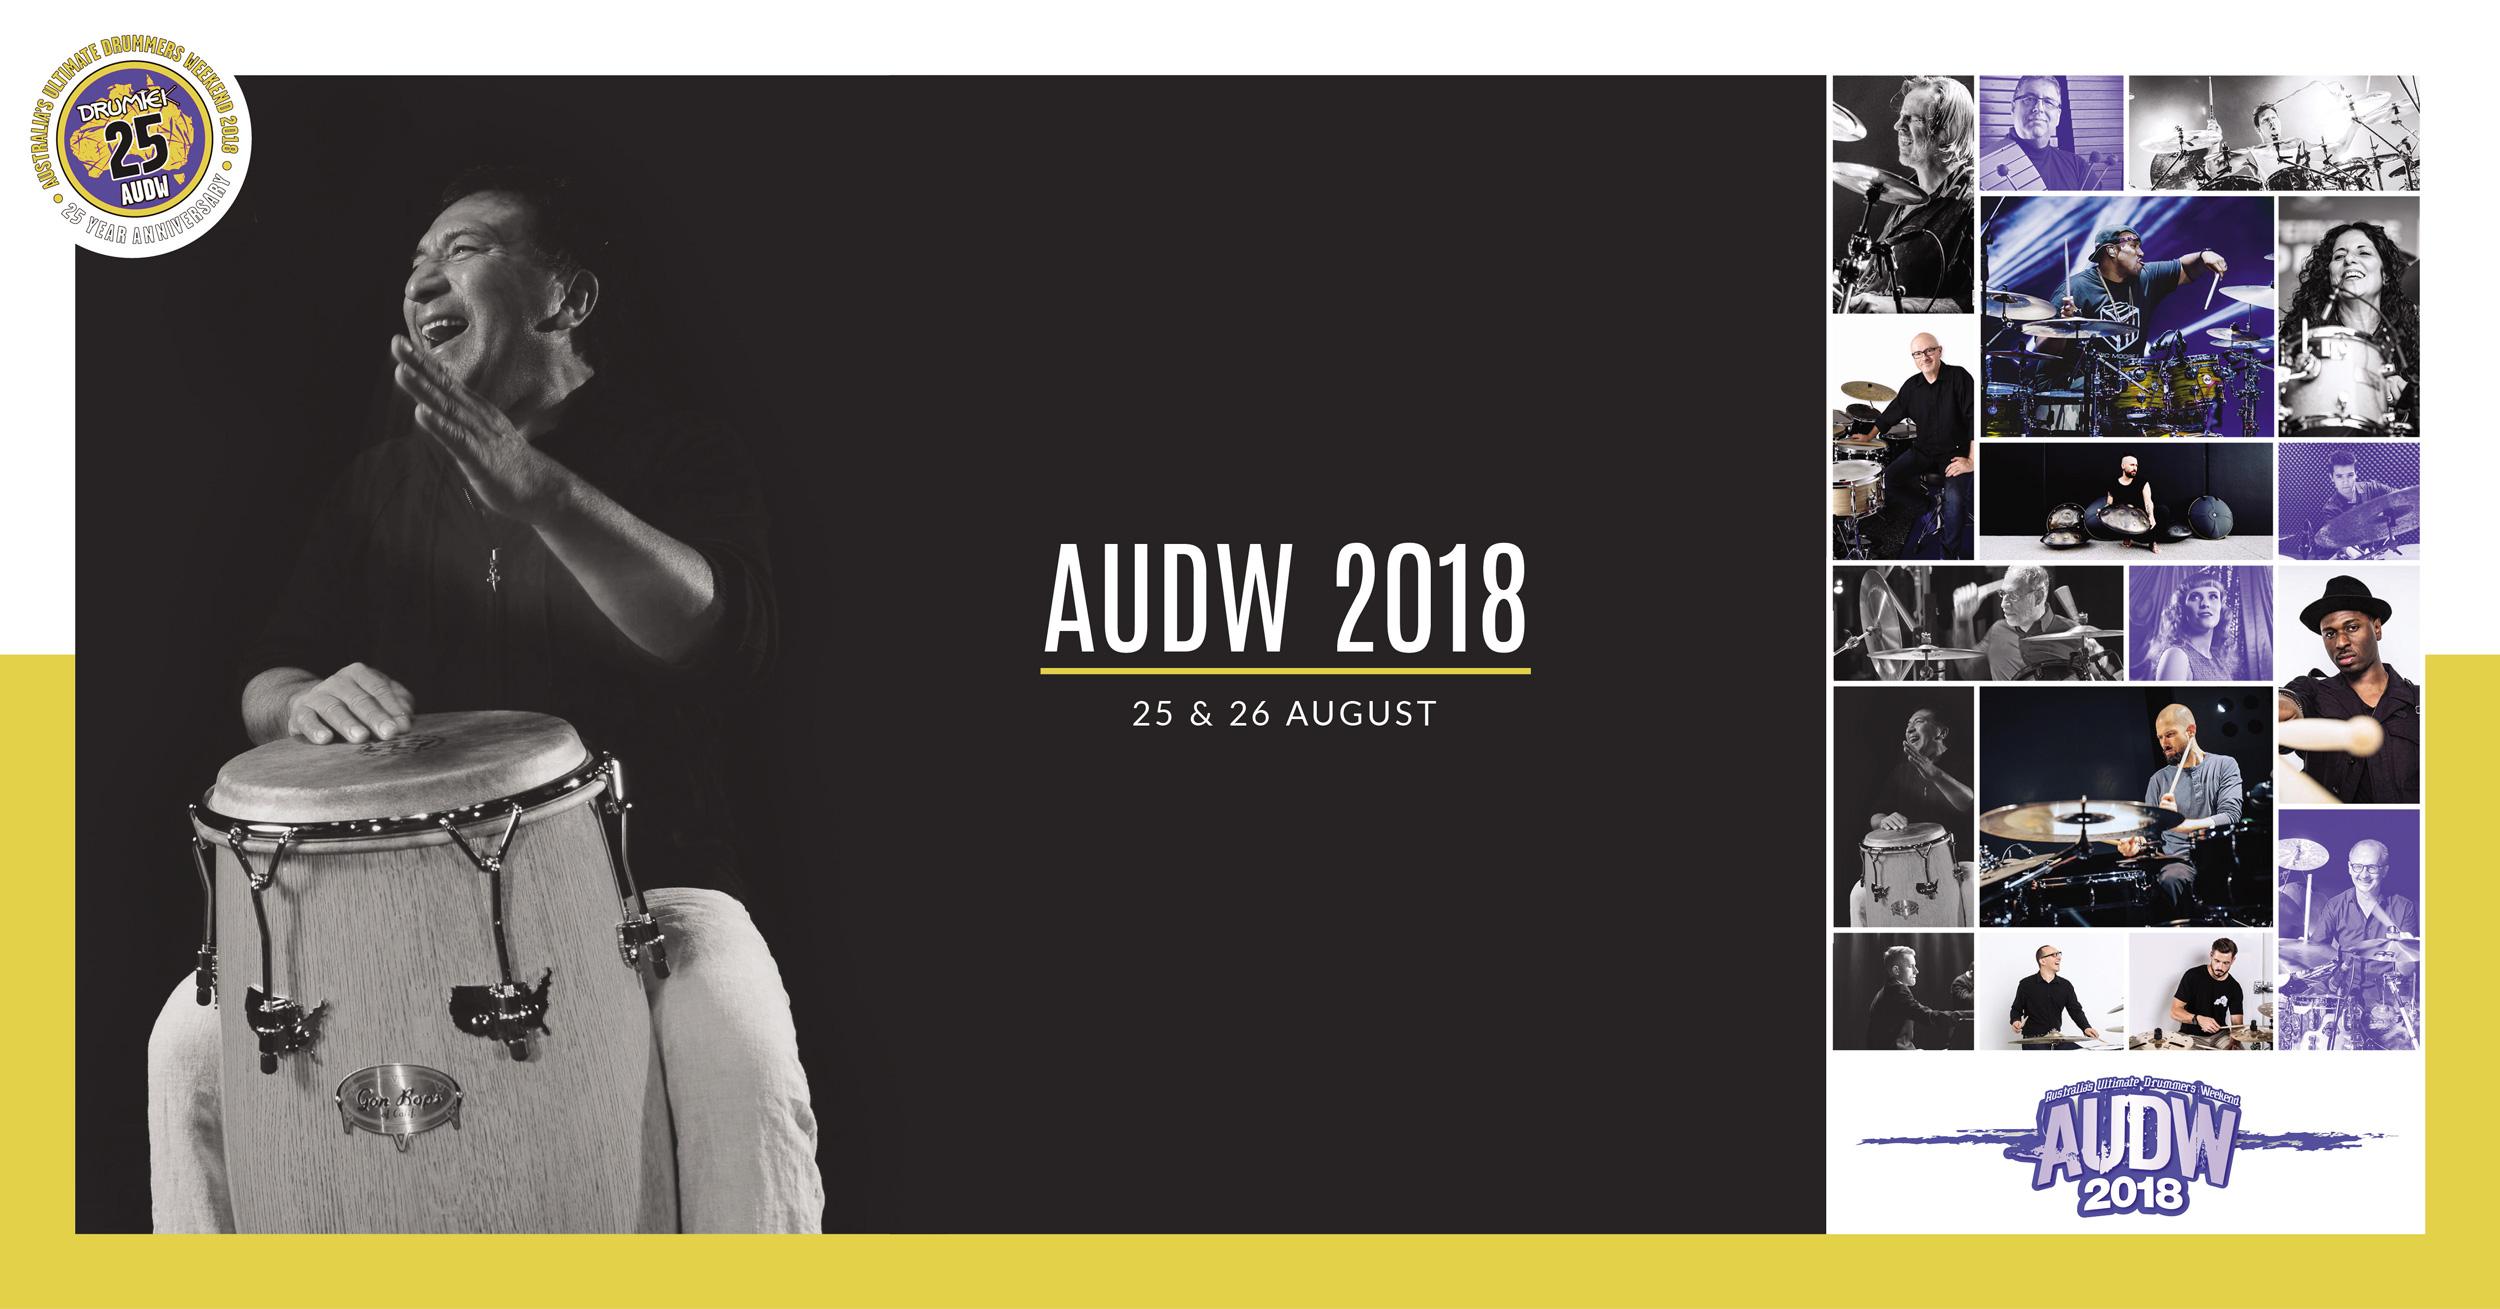 audw-facebook-banner-w-logo-sml.jpg